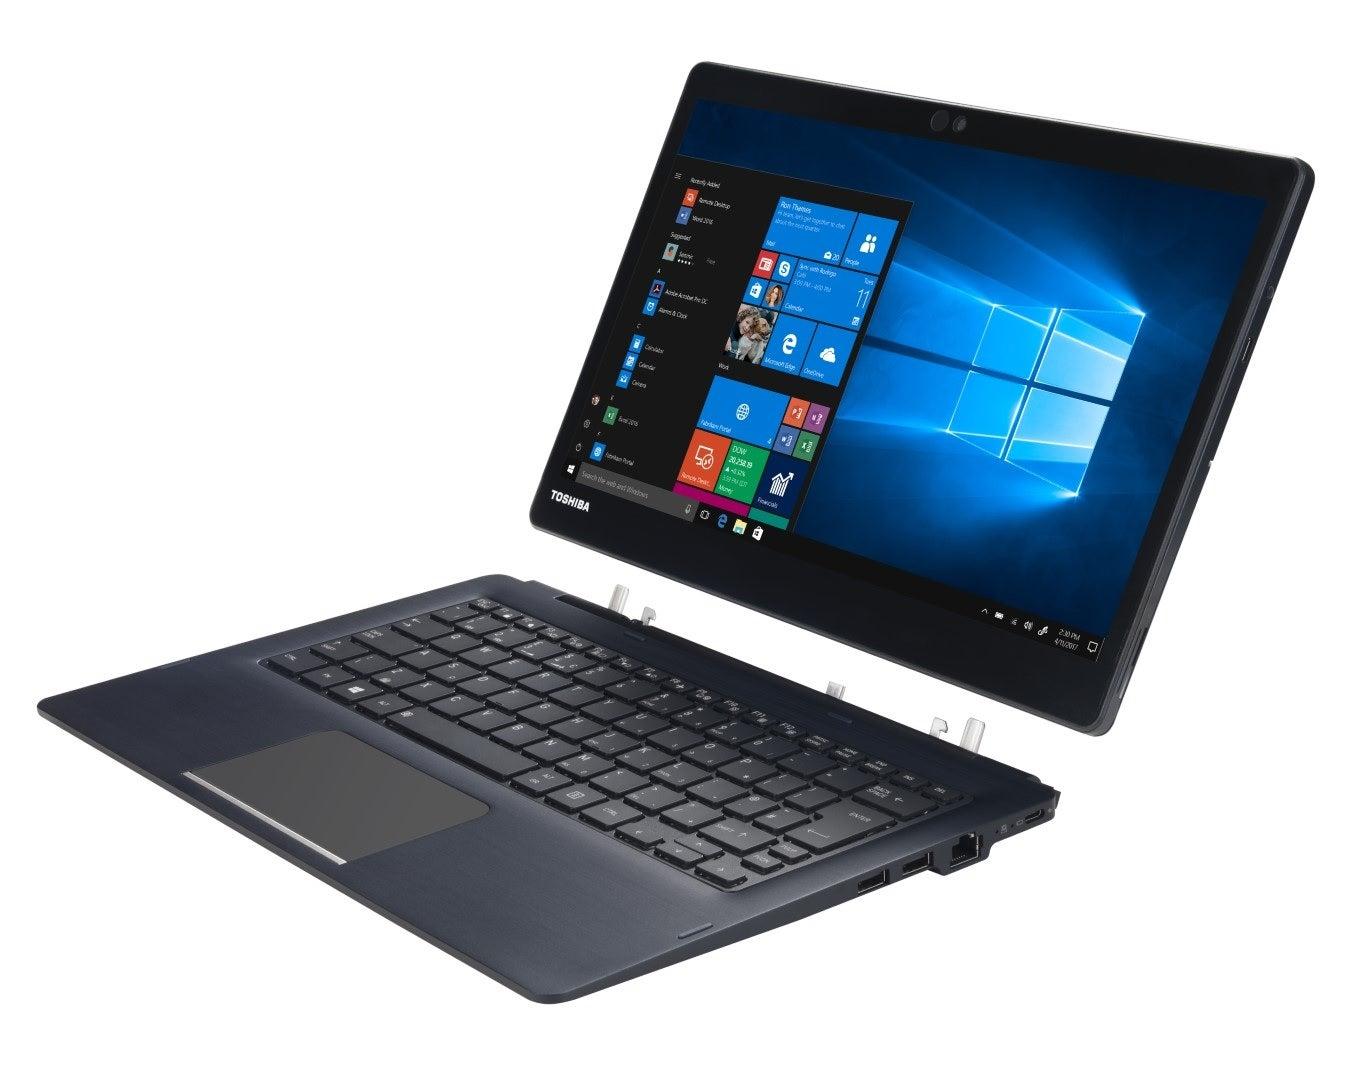 Toshiba Portege X30T 13 inch 2-in-1 Laptop